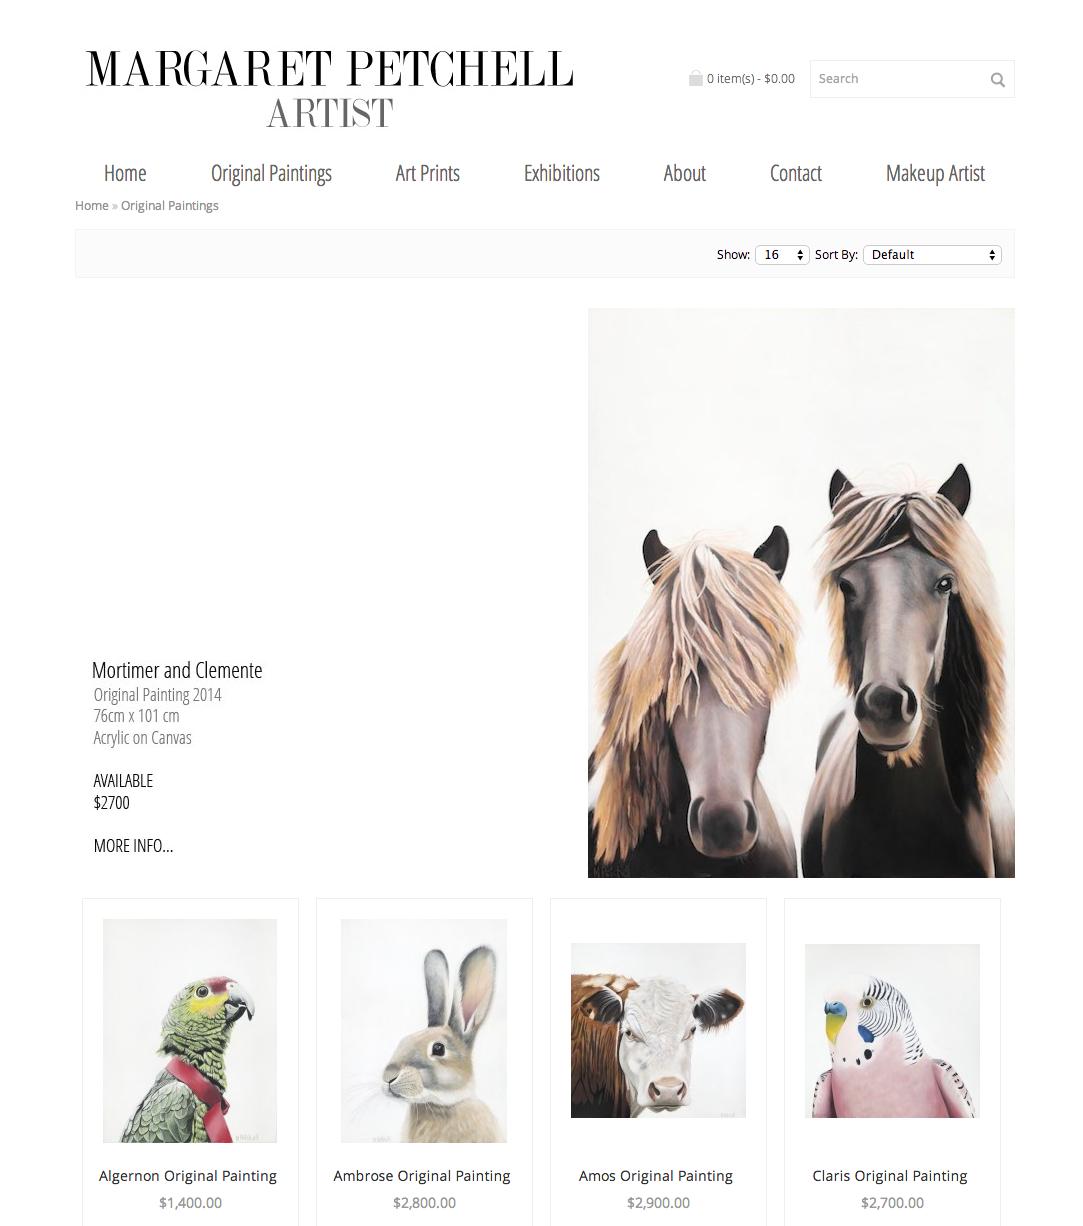 Website Design - Margaret Petchell Artist